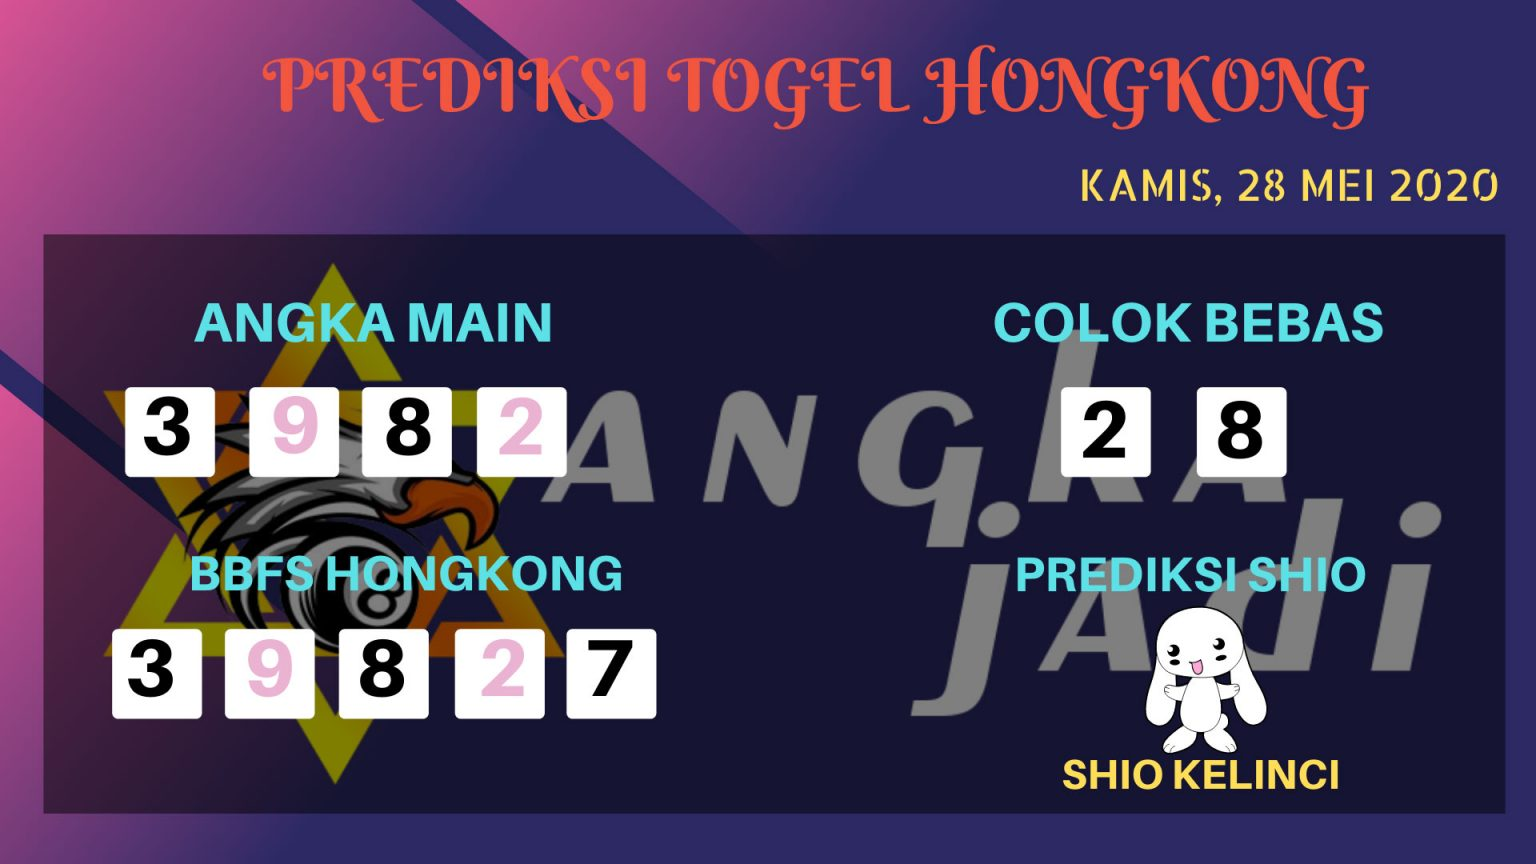 Prediksi HK Kamis 28 Mei 2020 - Bocoran HK